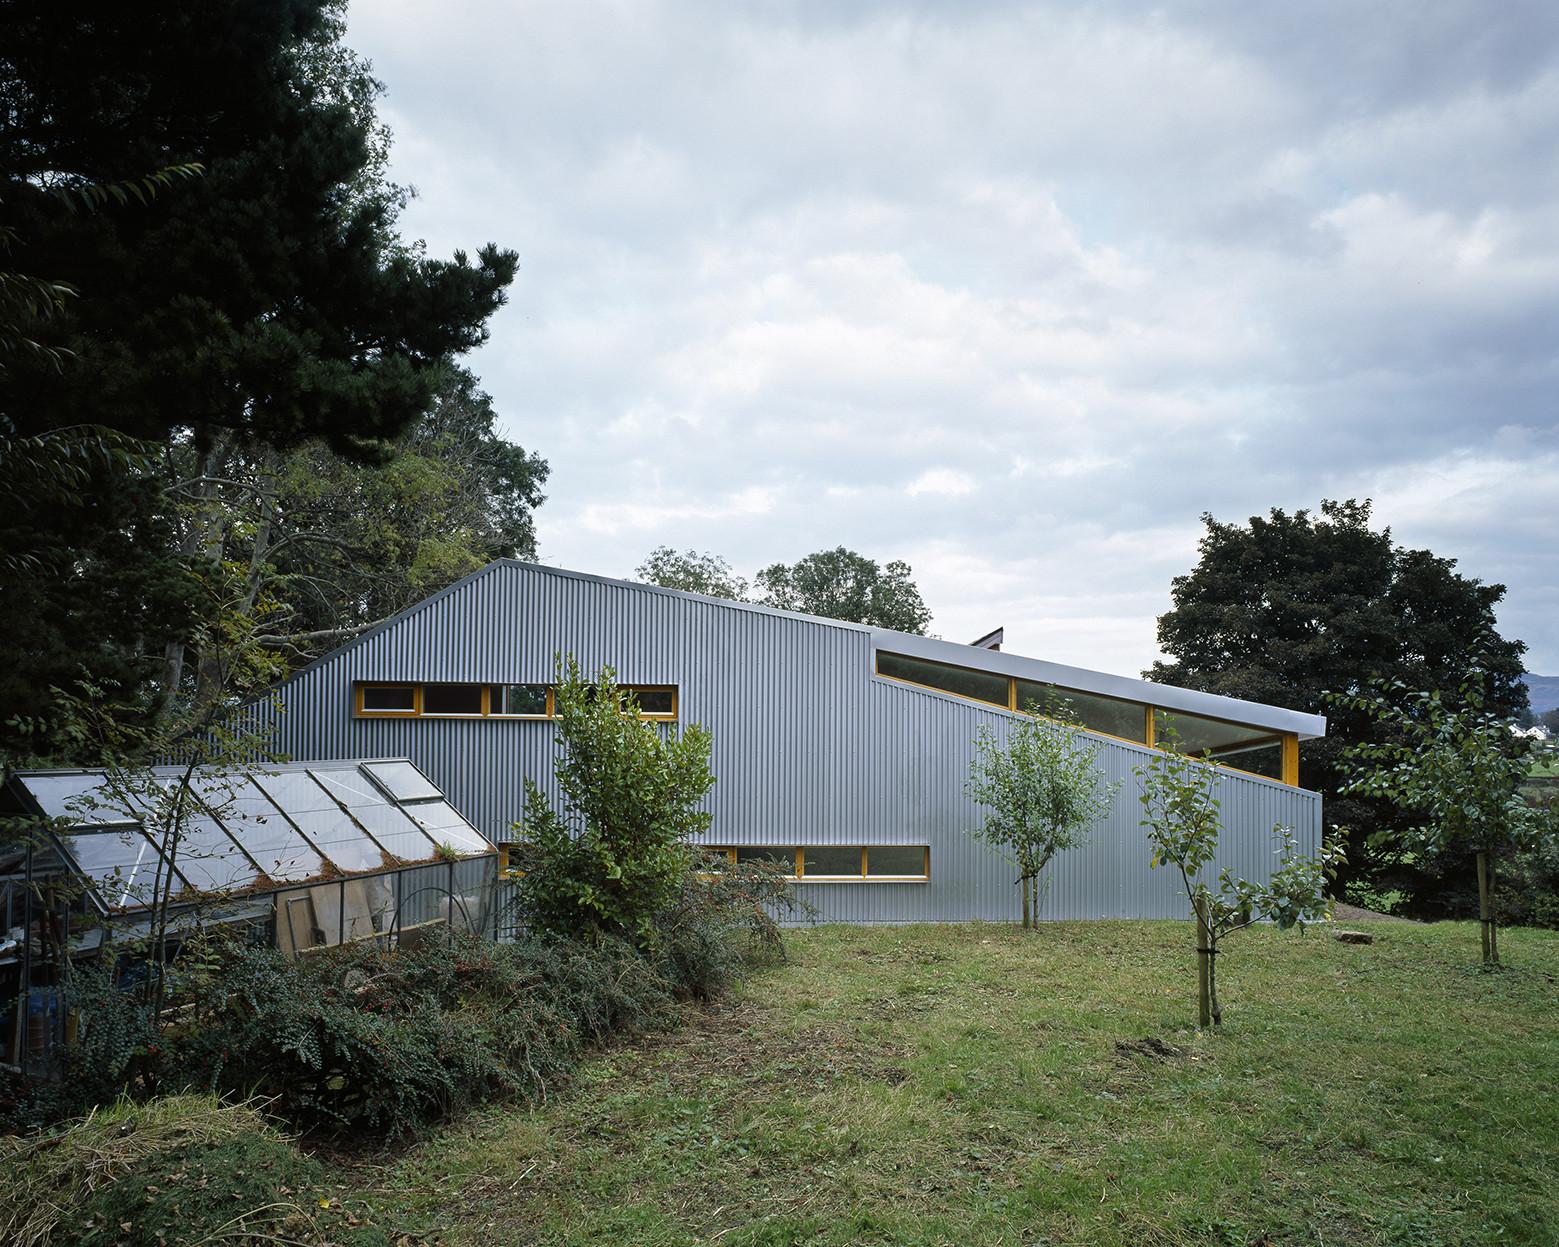 Green Box Architecture green box design studio macgabhann architects archdaily